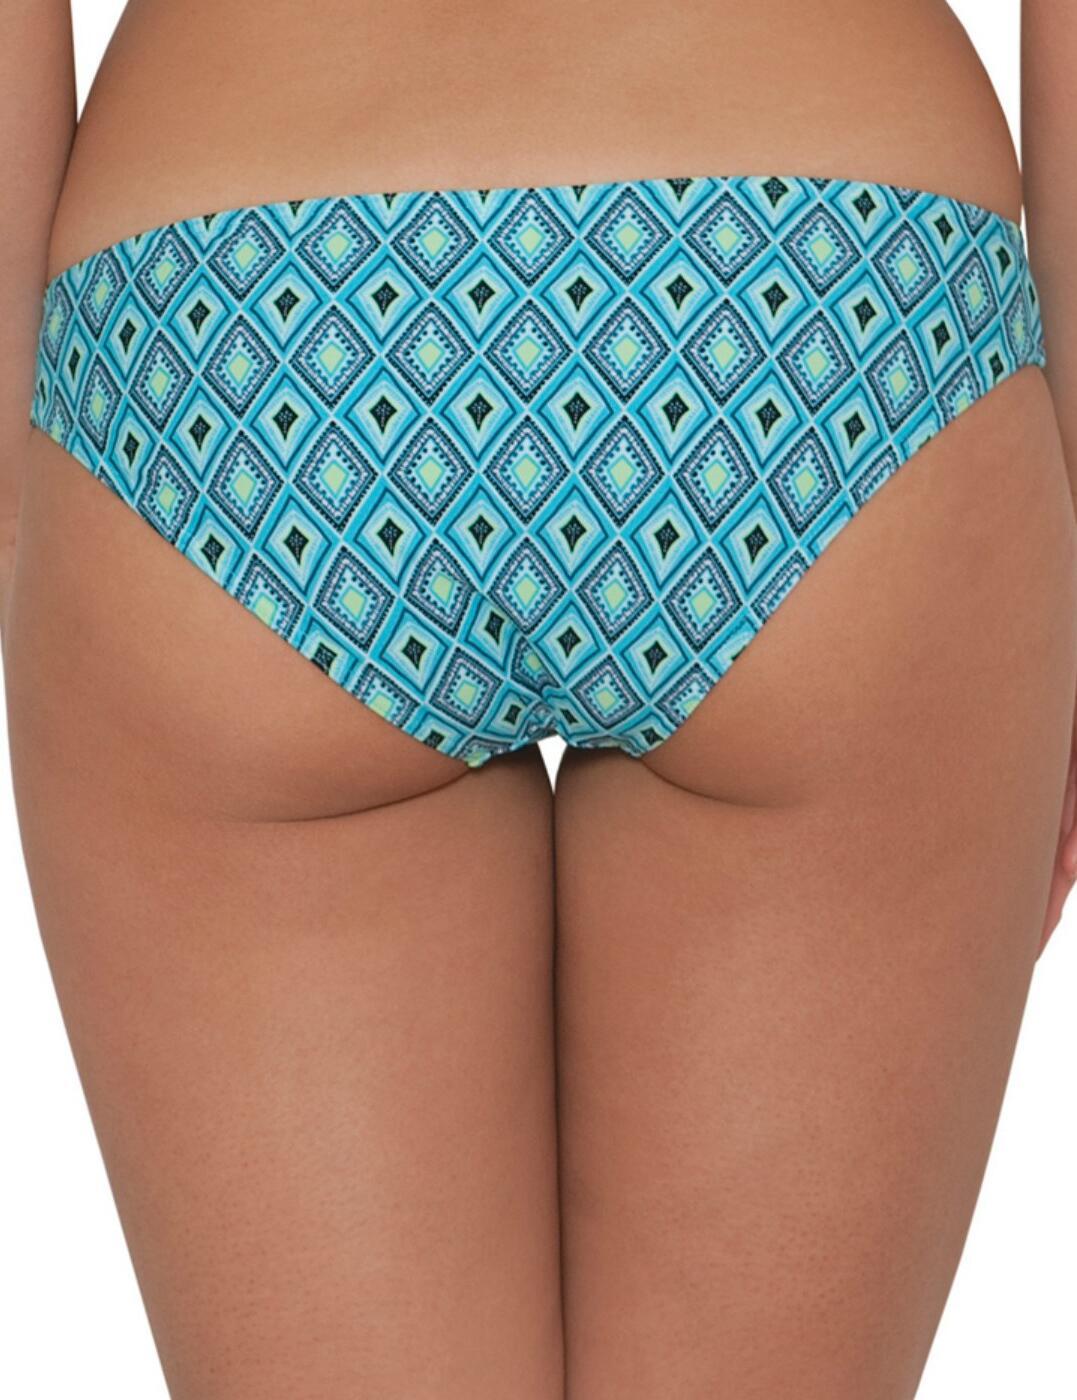 CS3405 Curvy Kate Revive Bikini Brief - CS3405 Aqua Print